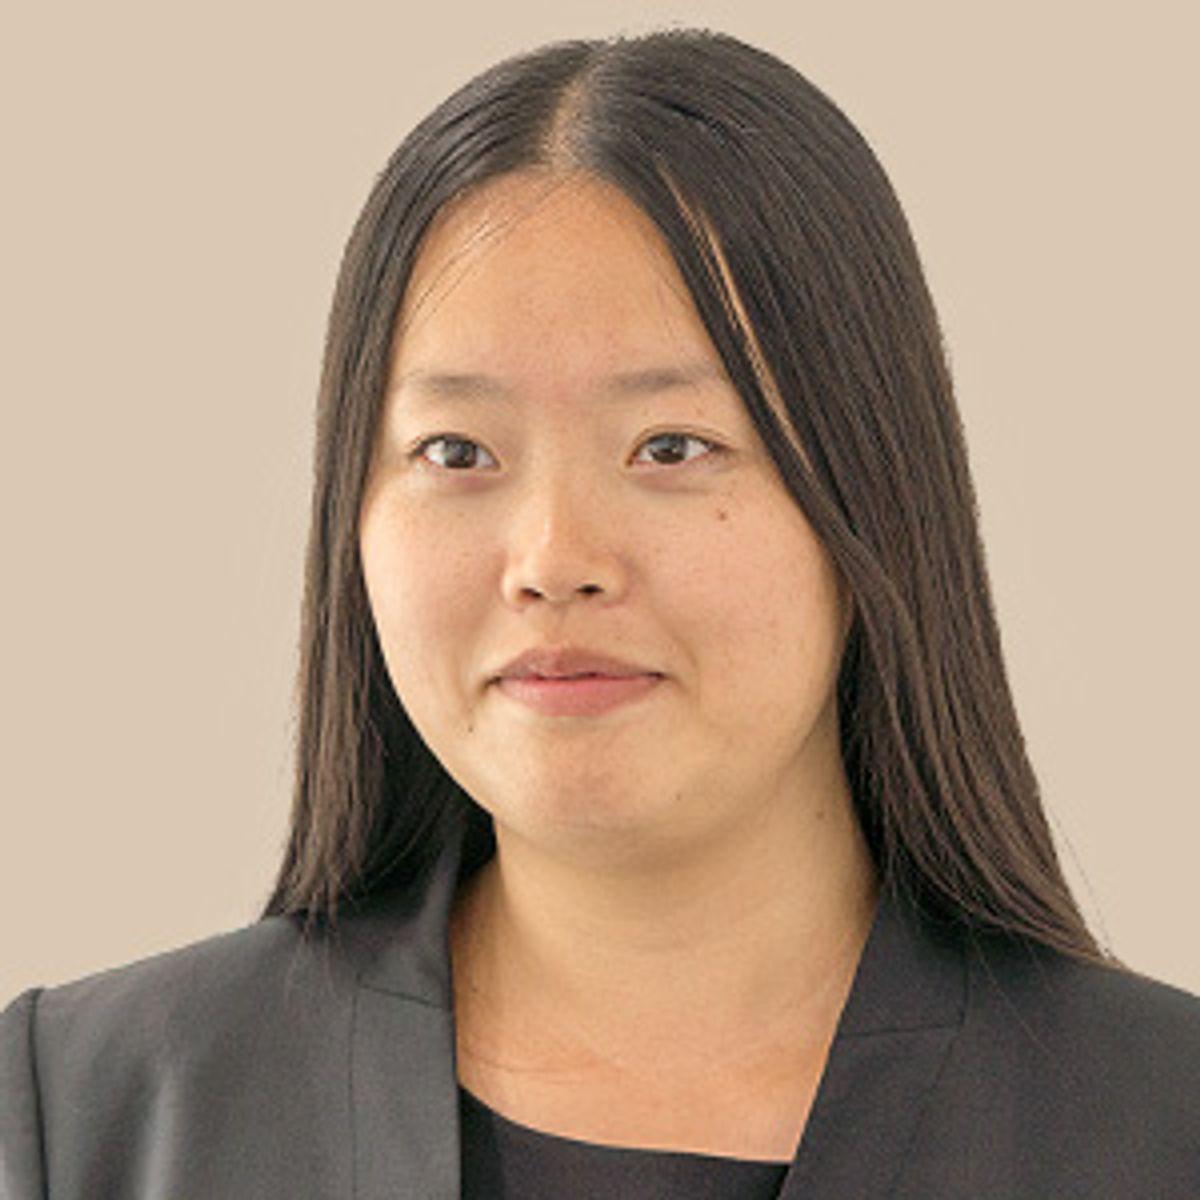 Amelia Cheng